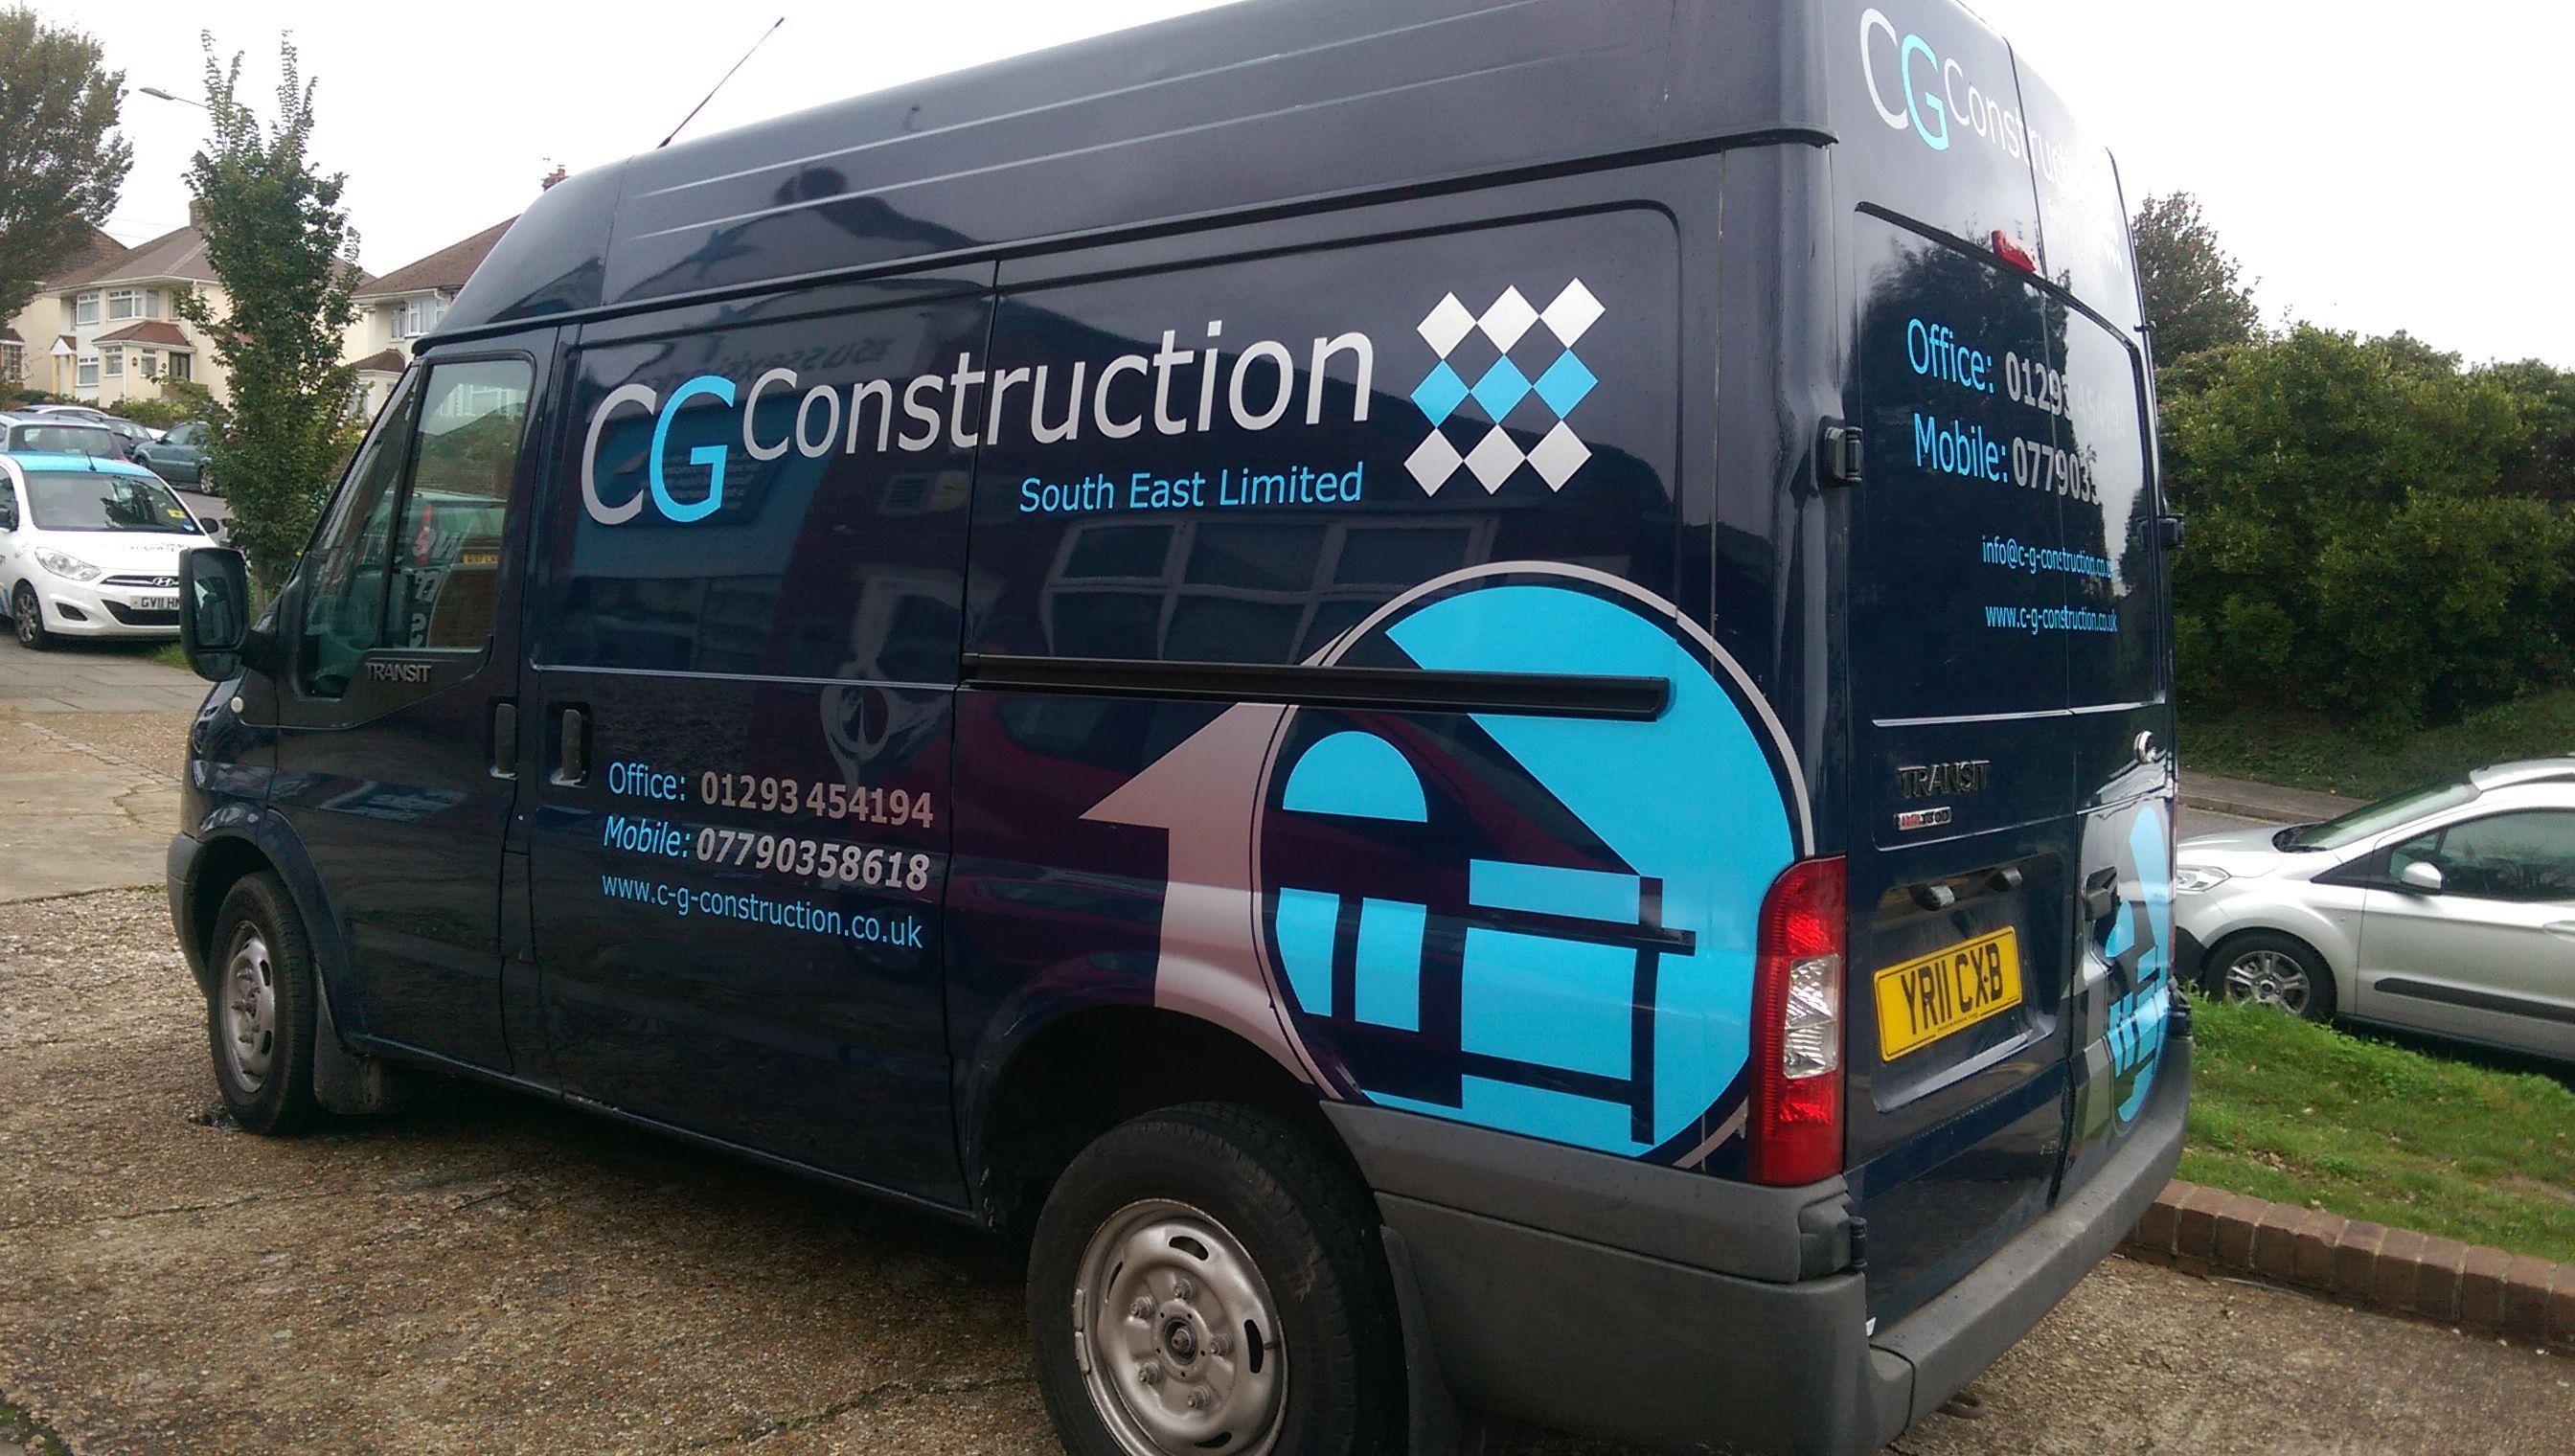 Cg Construction Van Partial Vinyl Wrap Done By The Sussex Sign Comany Van Signwriting Van Signs Van Design